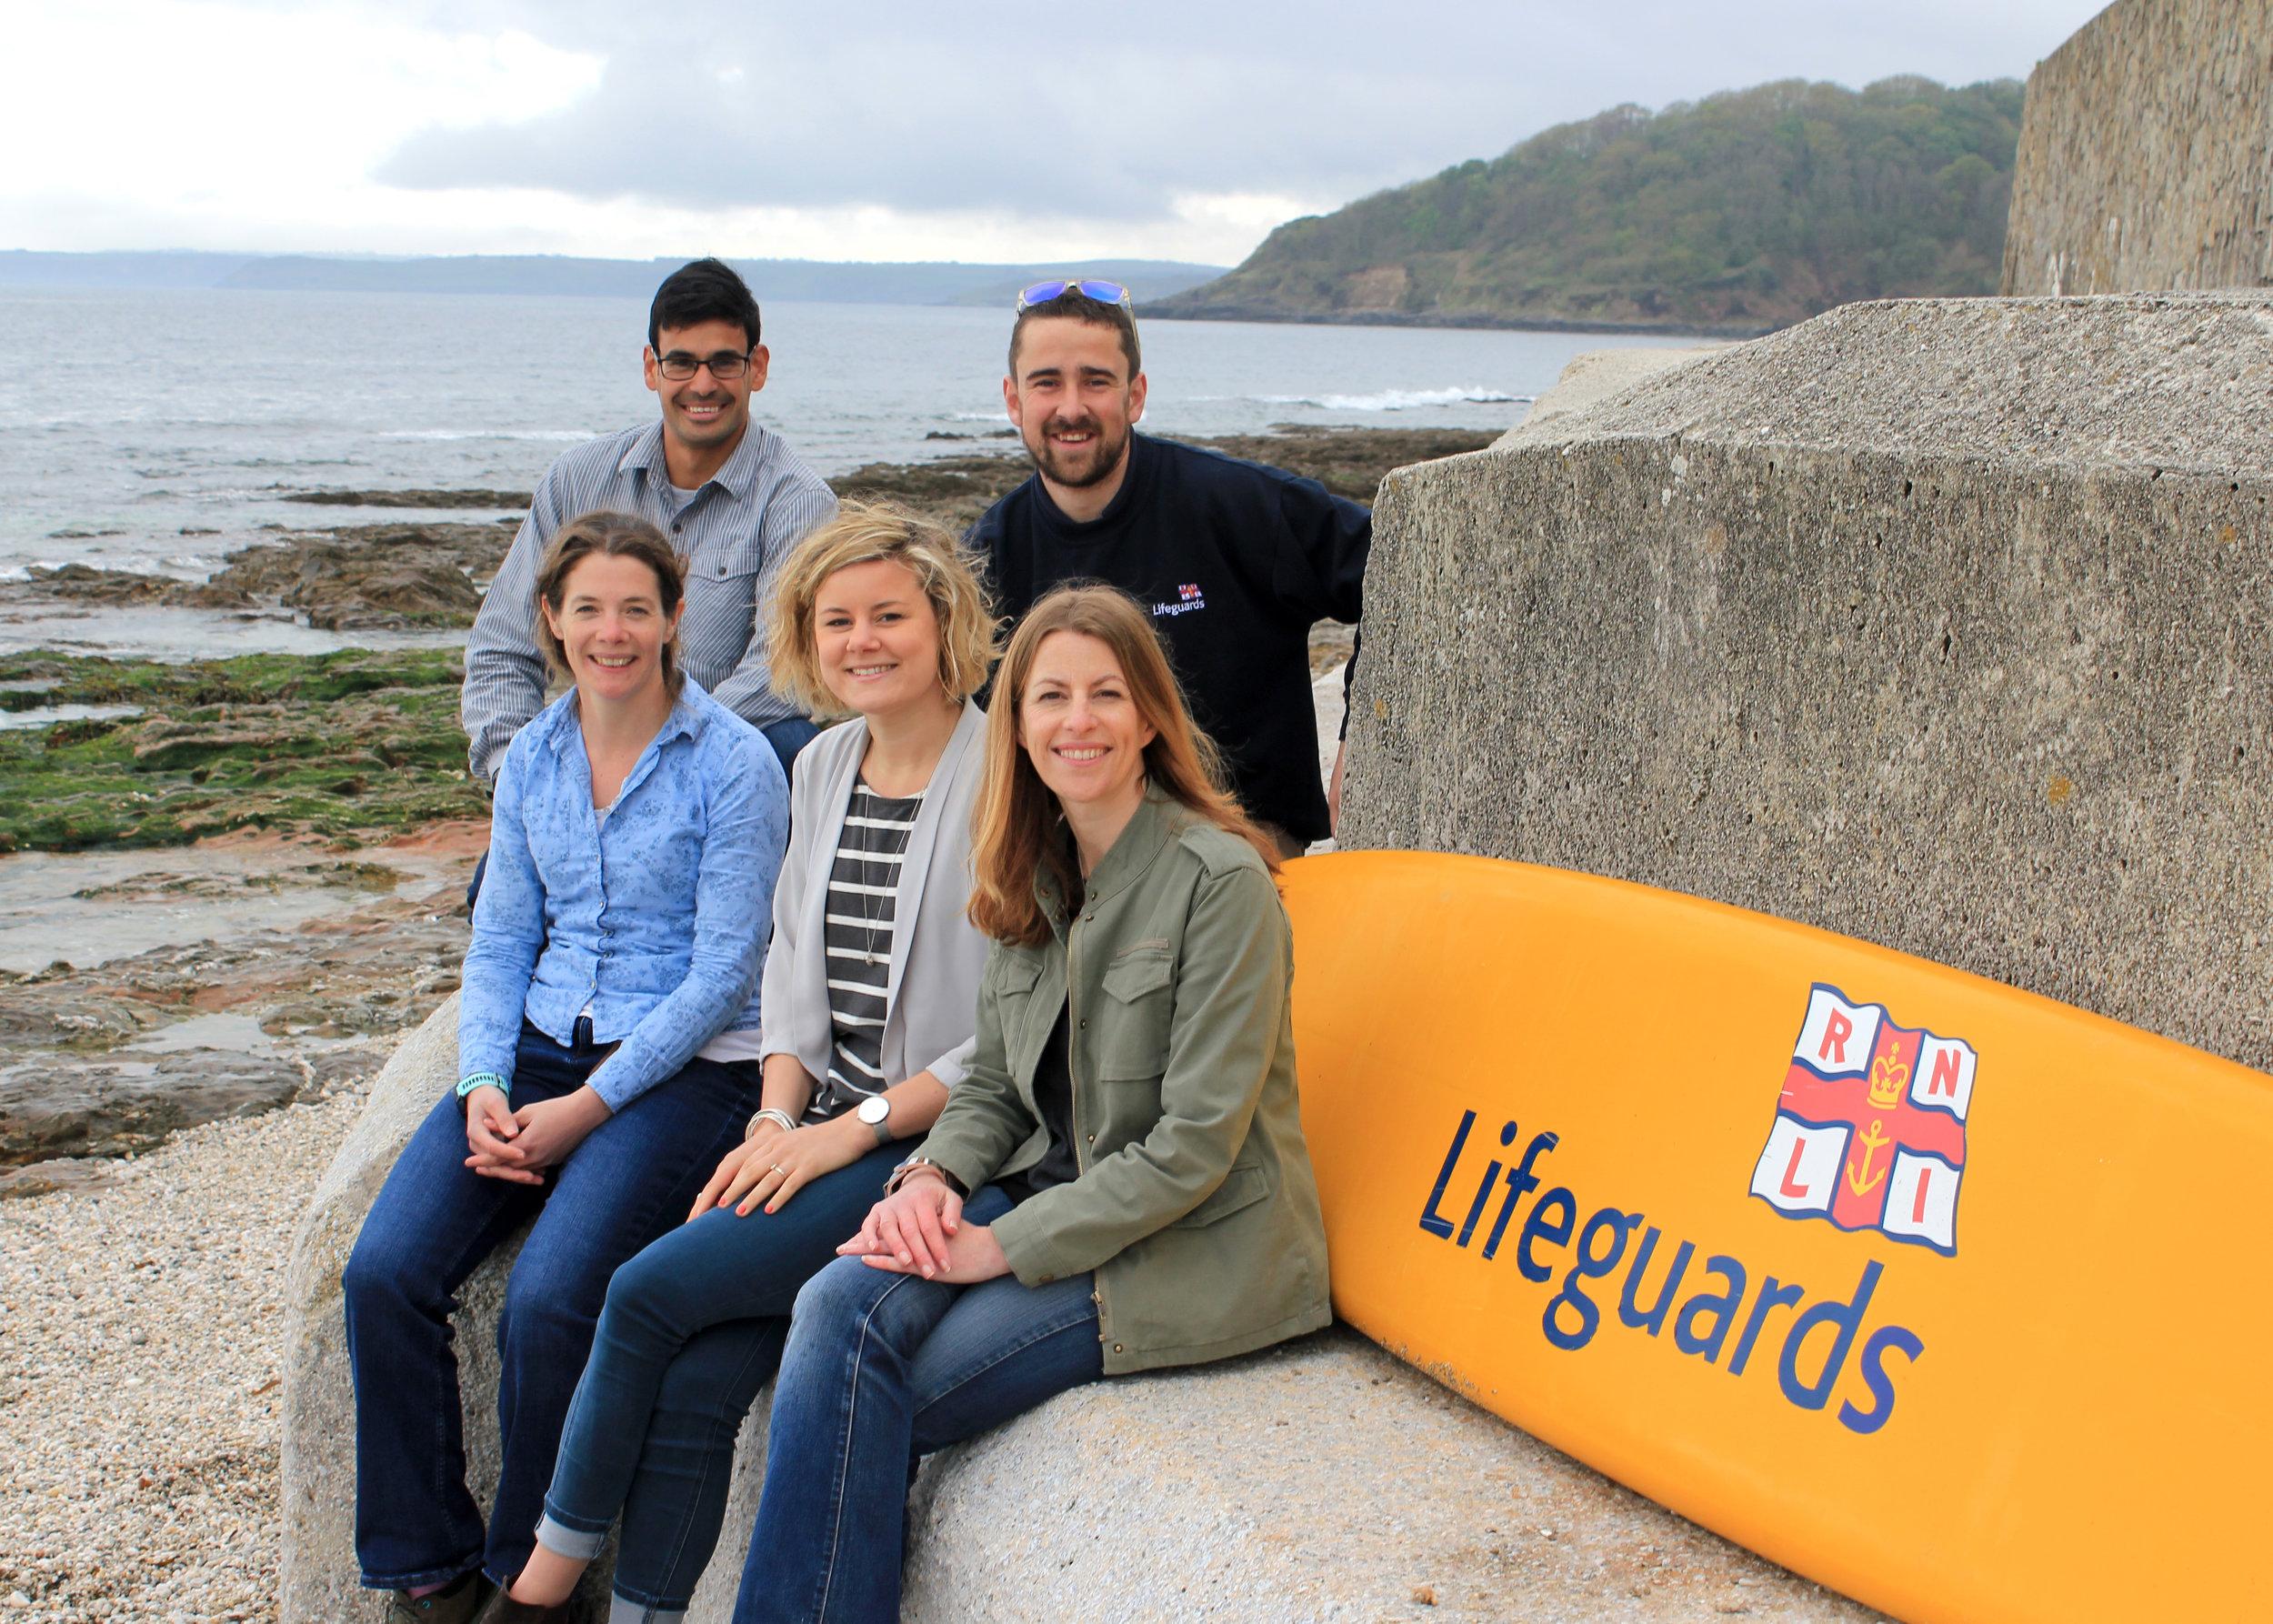 Team members from top left to bottom right: Matthew Stone, Adam Harris (RNLI Lifeguard Supervisor), Amy Sergison, Bethia Naughton-Rumbo and Kathryn Woolf.